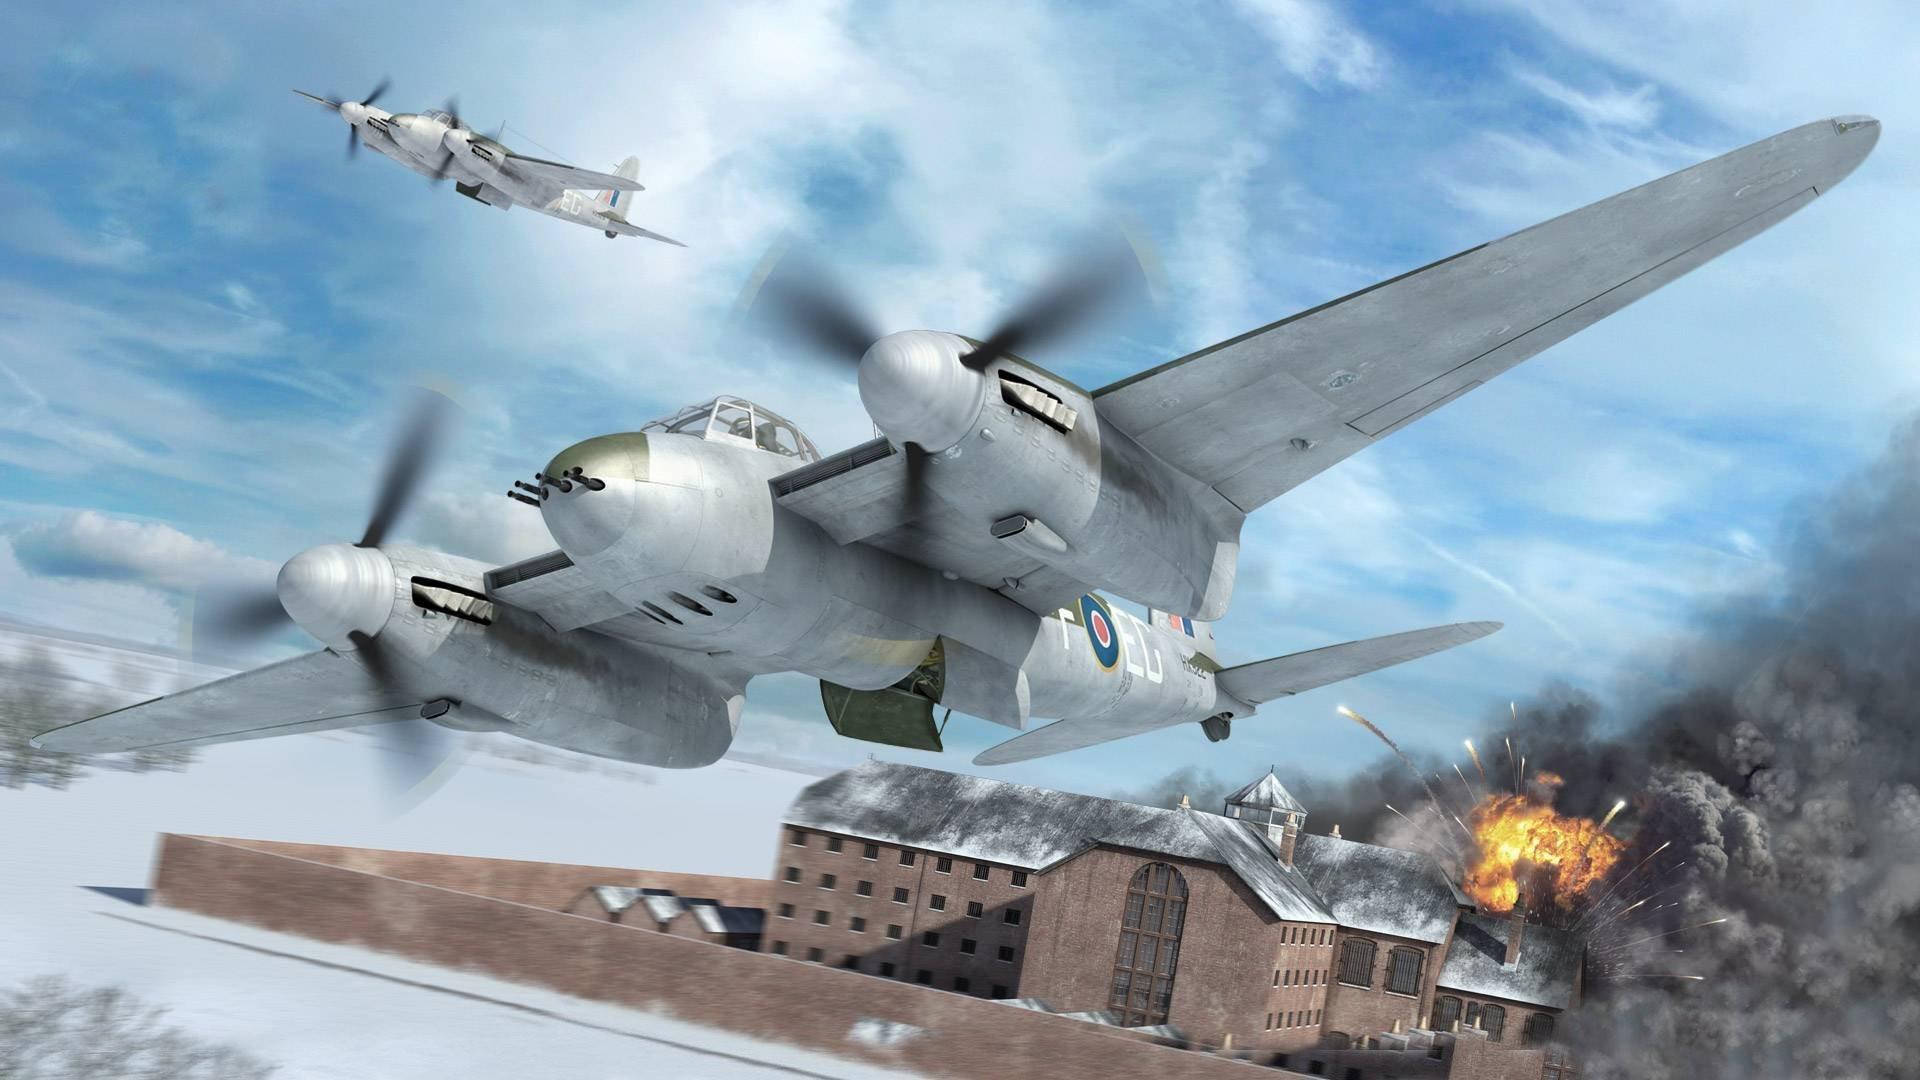 de havilland mosquito british multi-purpose bomber night fighter of world  war ii picture art